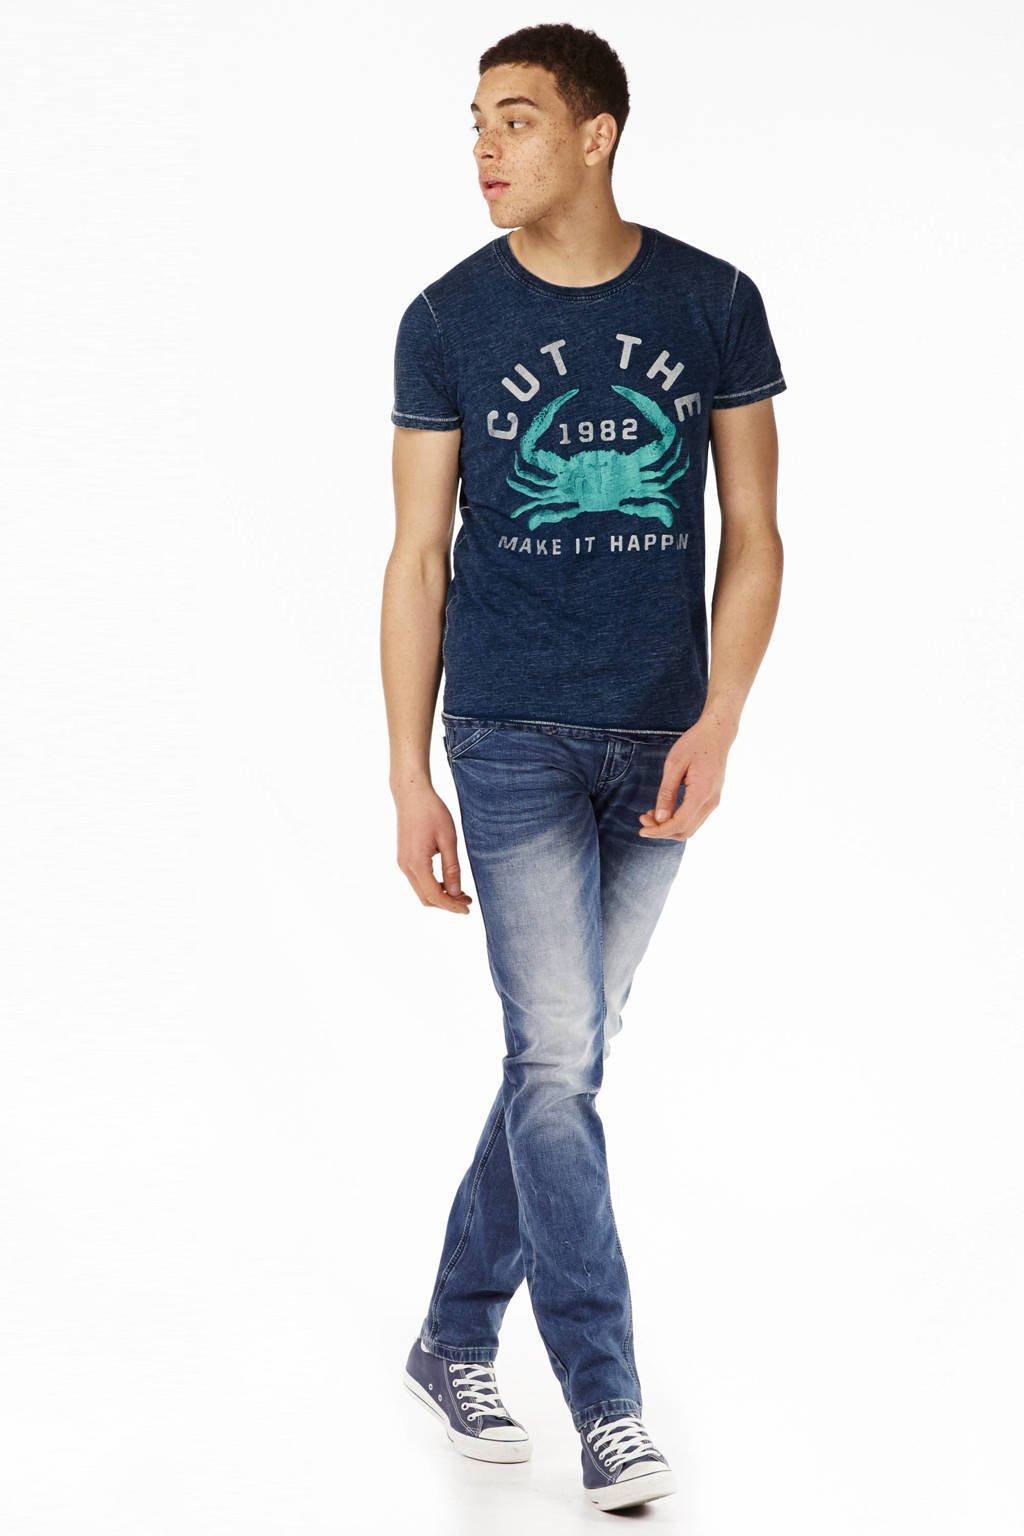 Cars regular fit jeans Yareth, Dark pittsfield wash